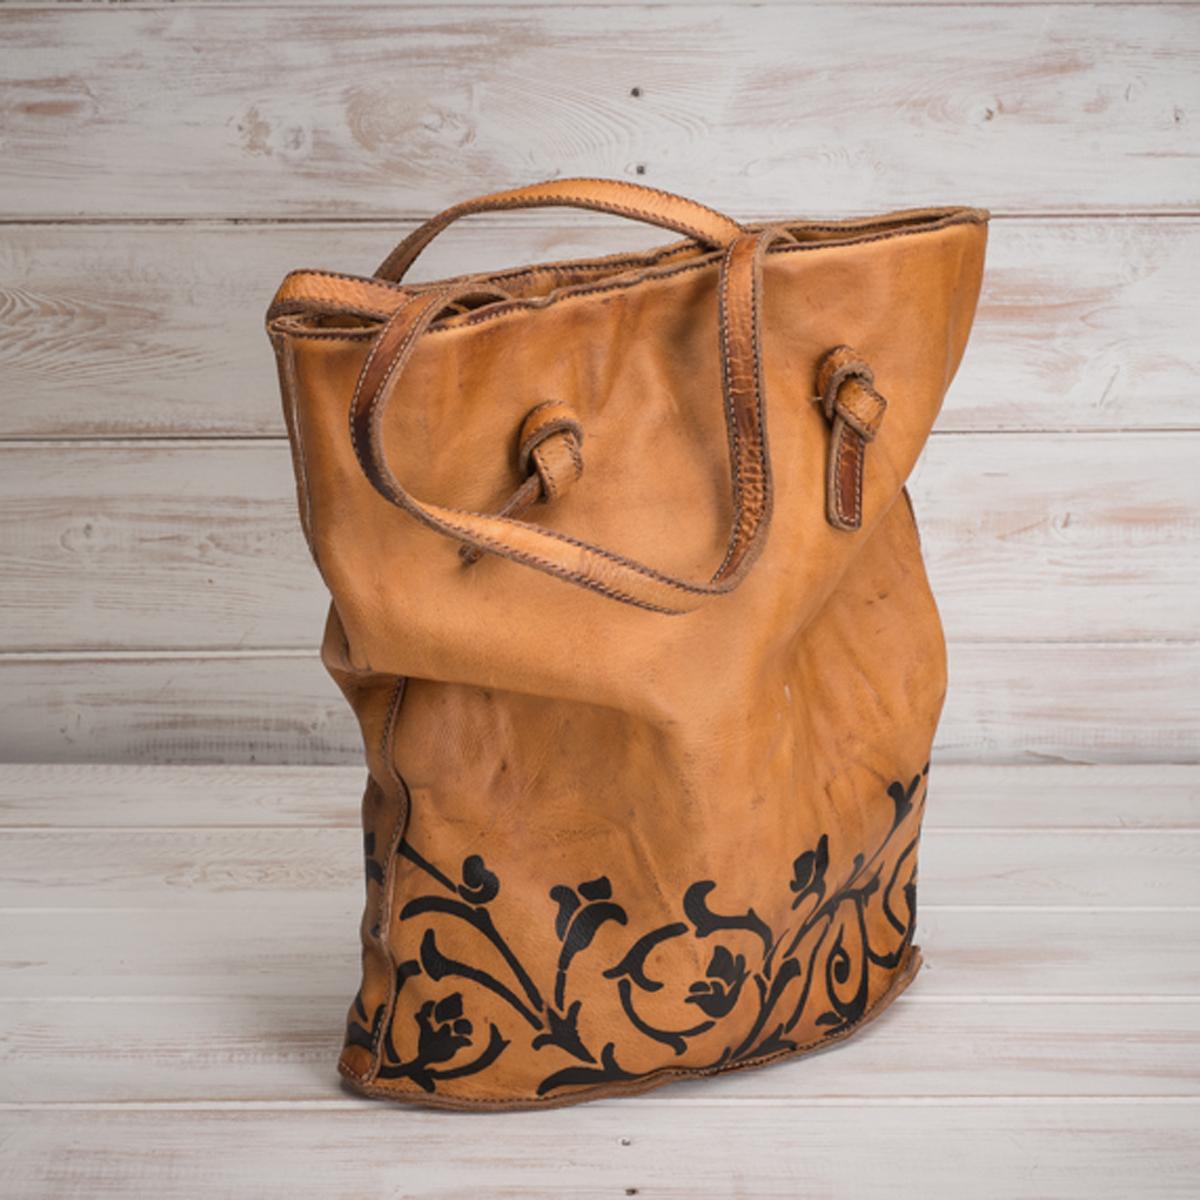 Italian artisan handmade leather bag